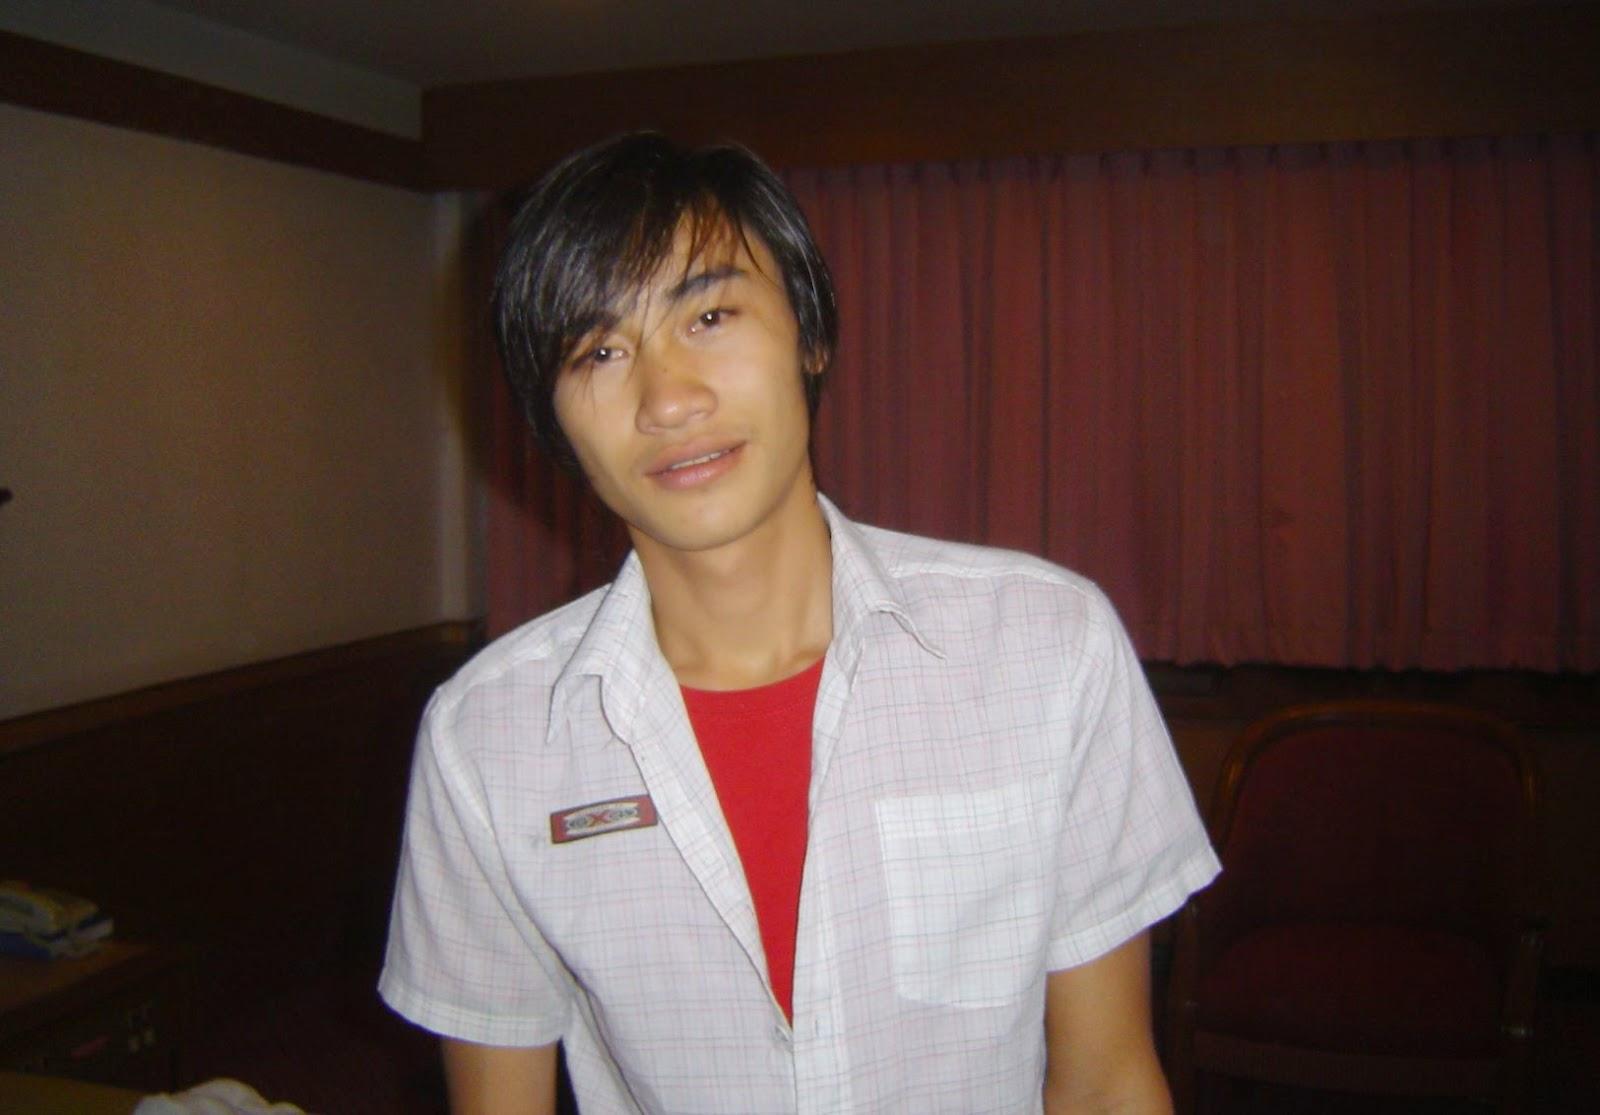 Lao boy in Pattaya